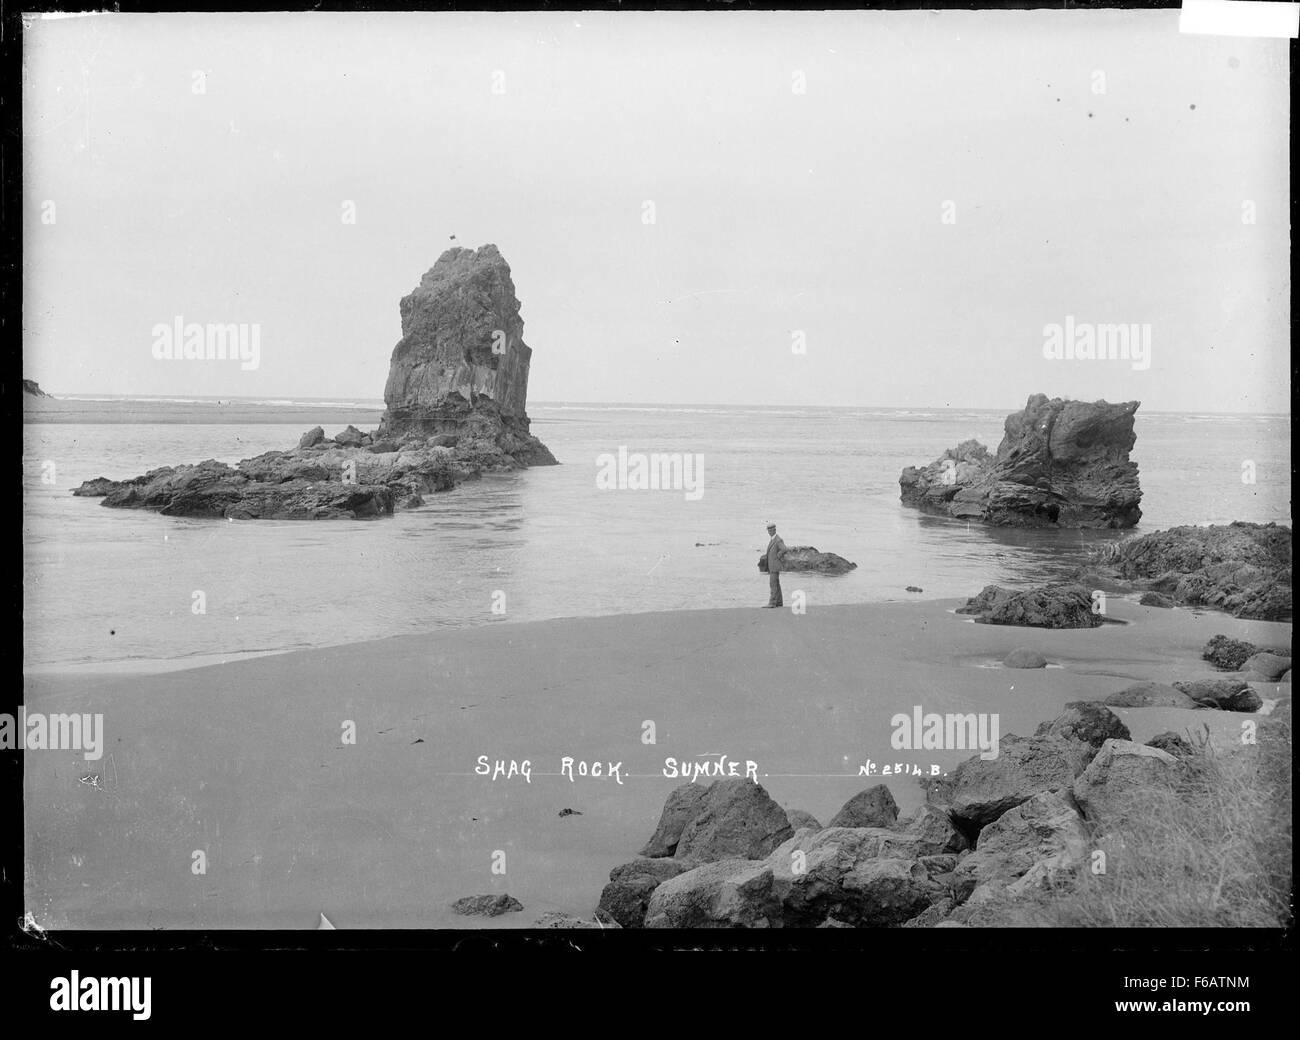 View of Shag Rock at Sumner, near Christchurch - Stock Image